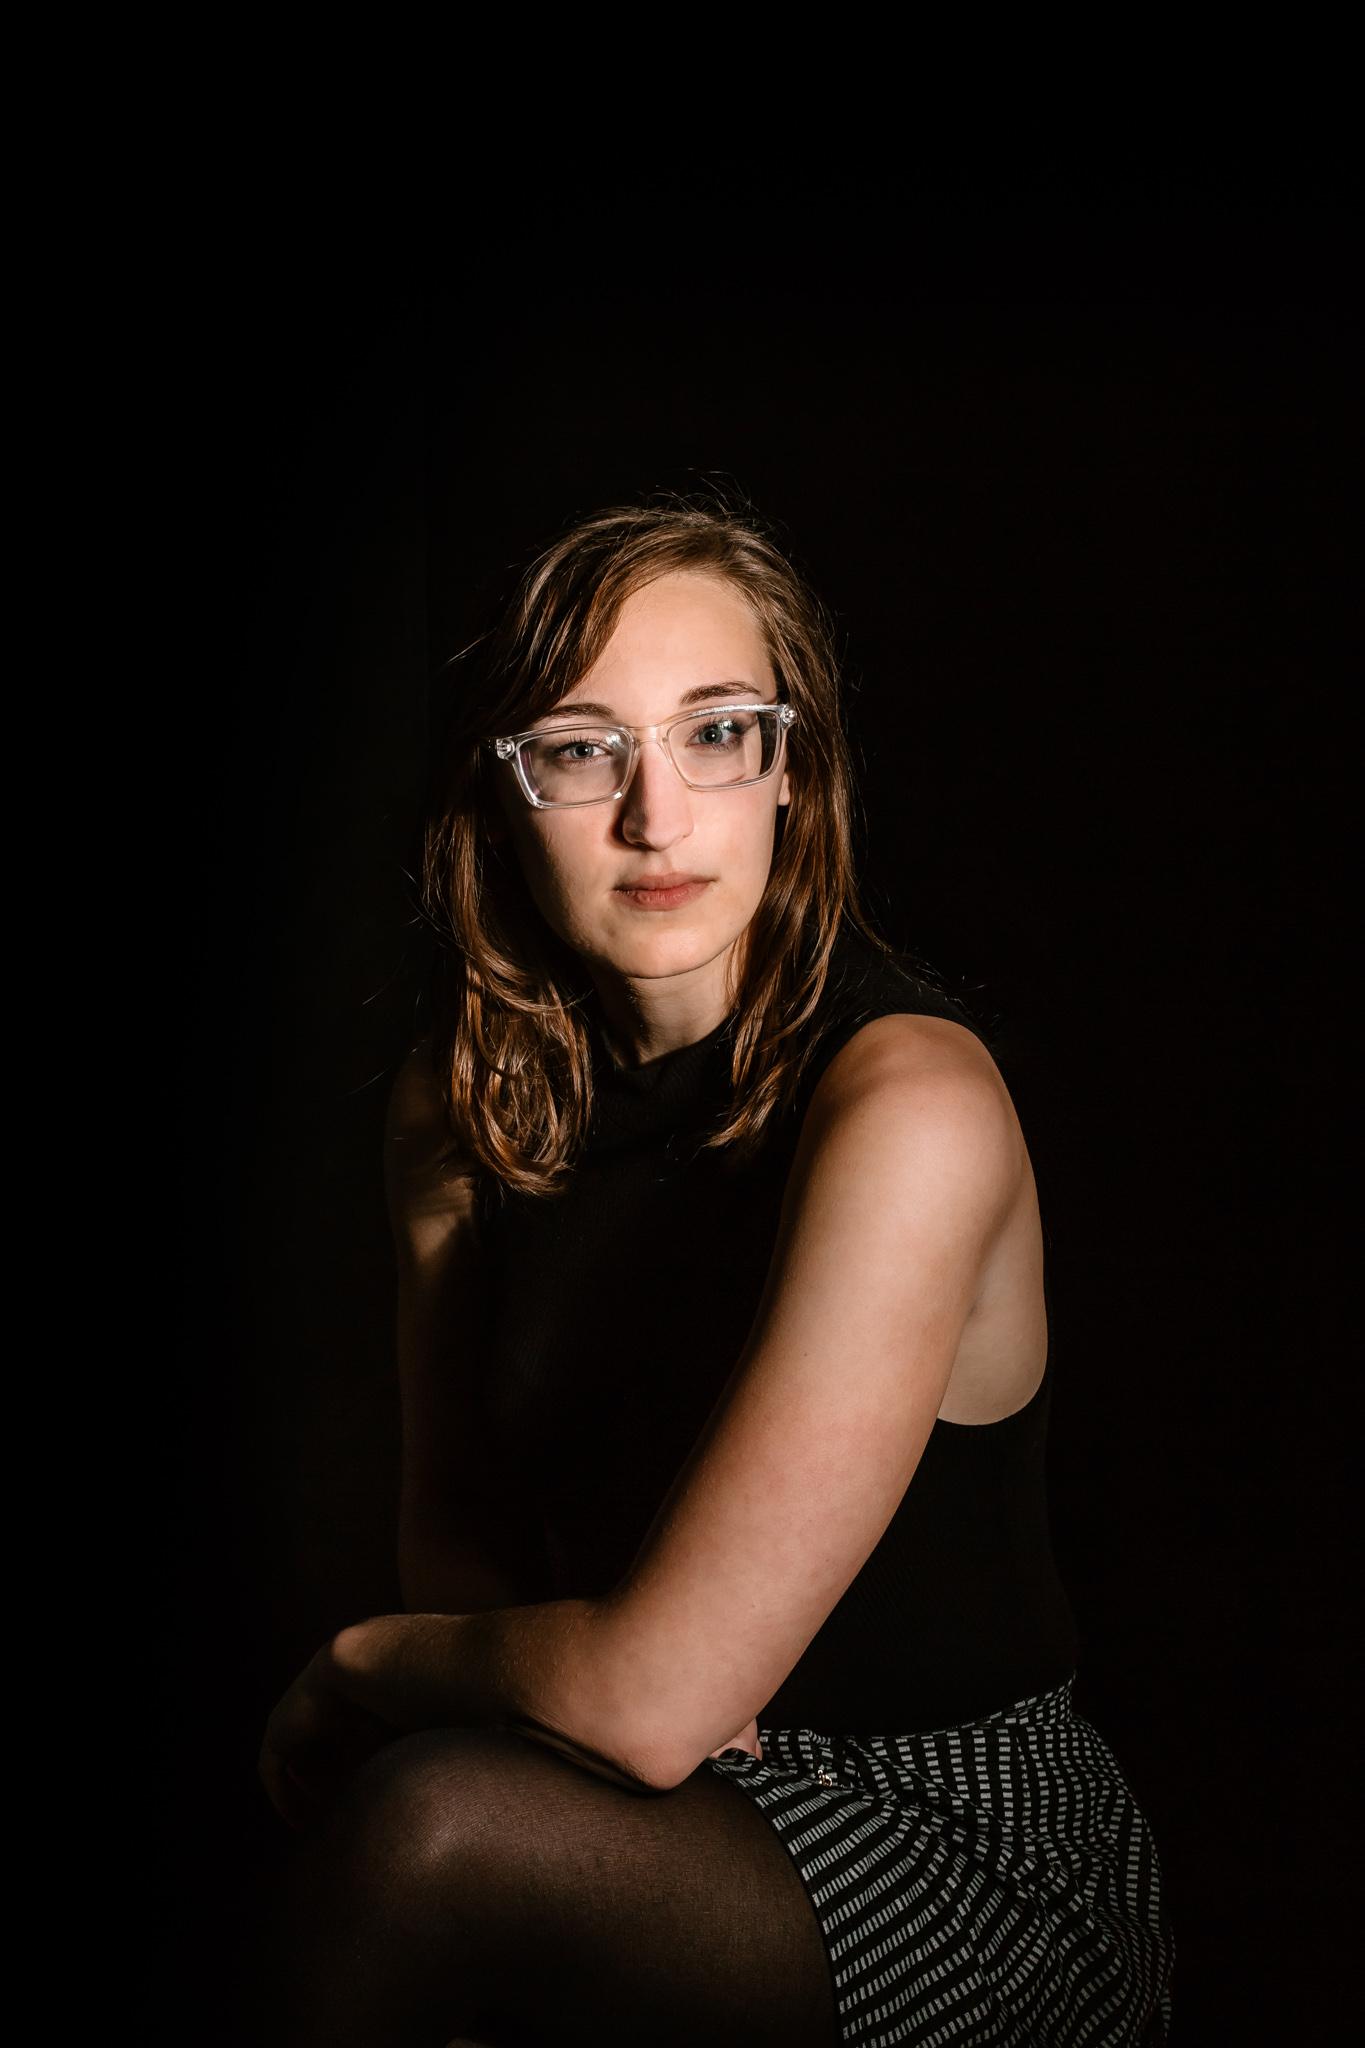 Alexa-Vossler-Photo_-7.jpg